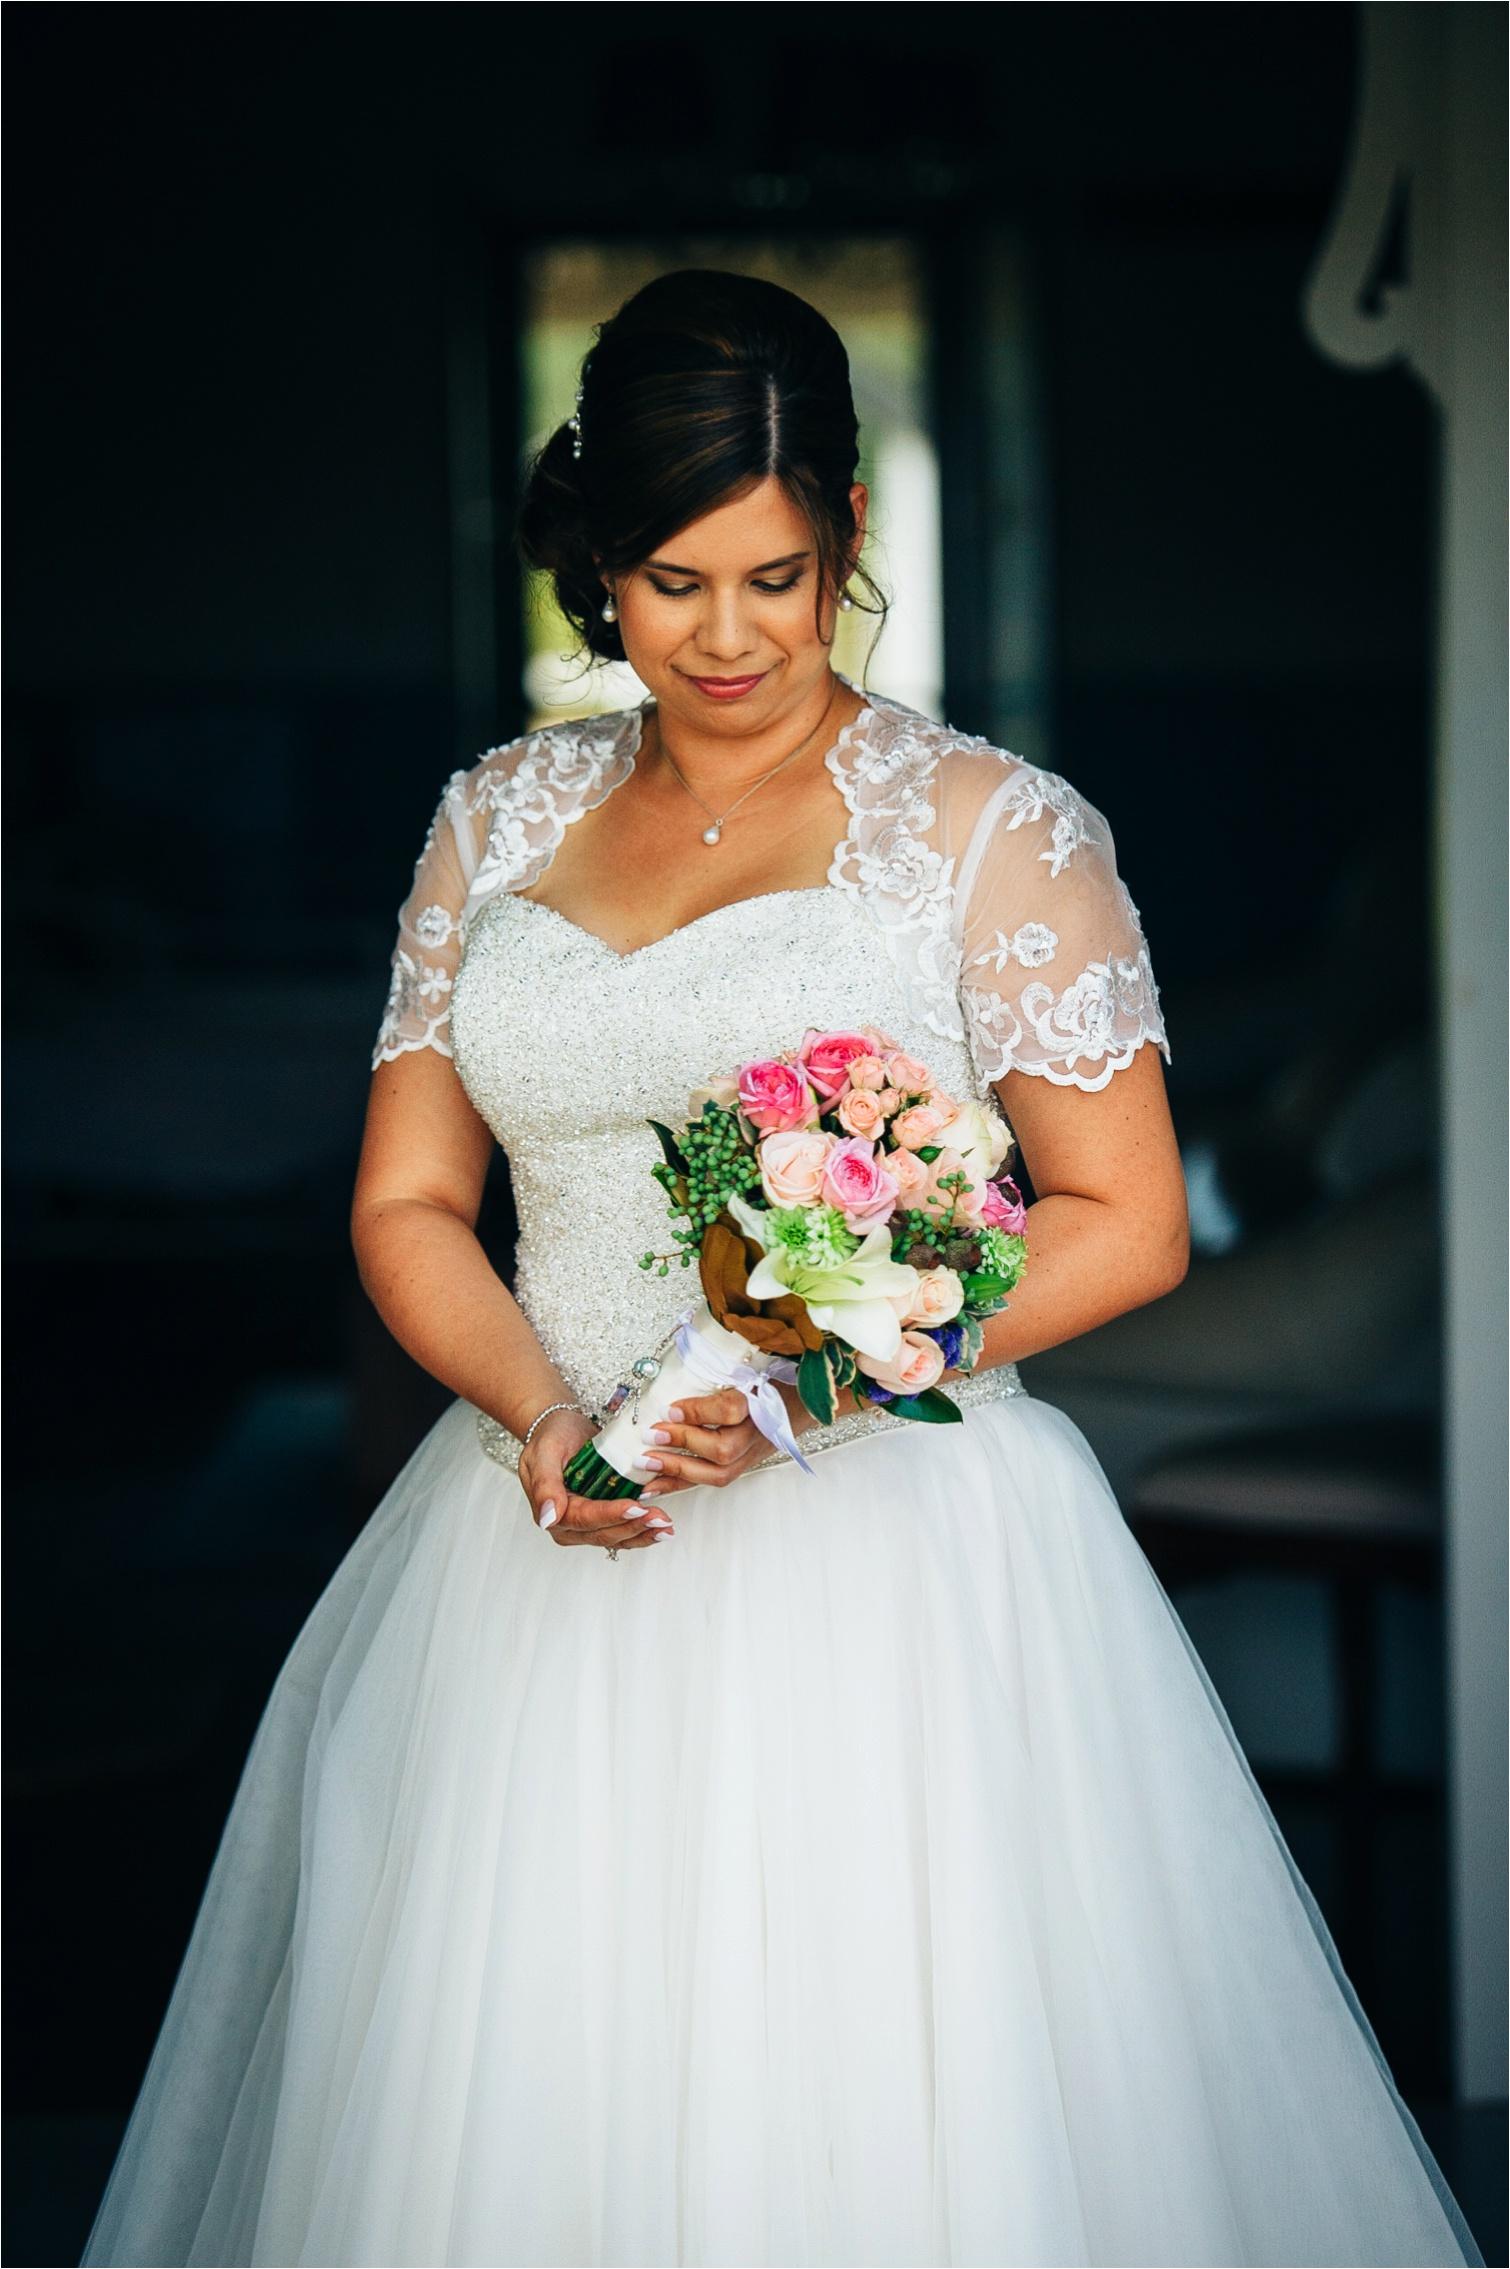 Cherish&Morgan_Albert_River_Wines_wedding-by_The_Follans_Gold_Coast_Wedding_Photographers_0014.jpg